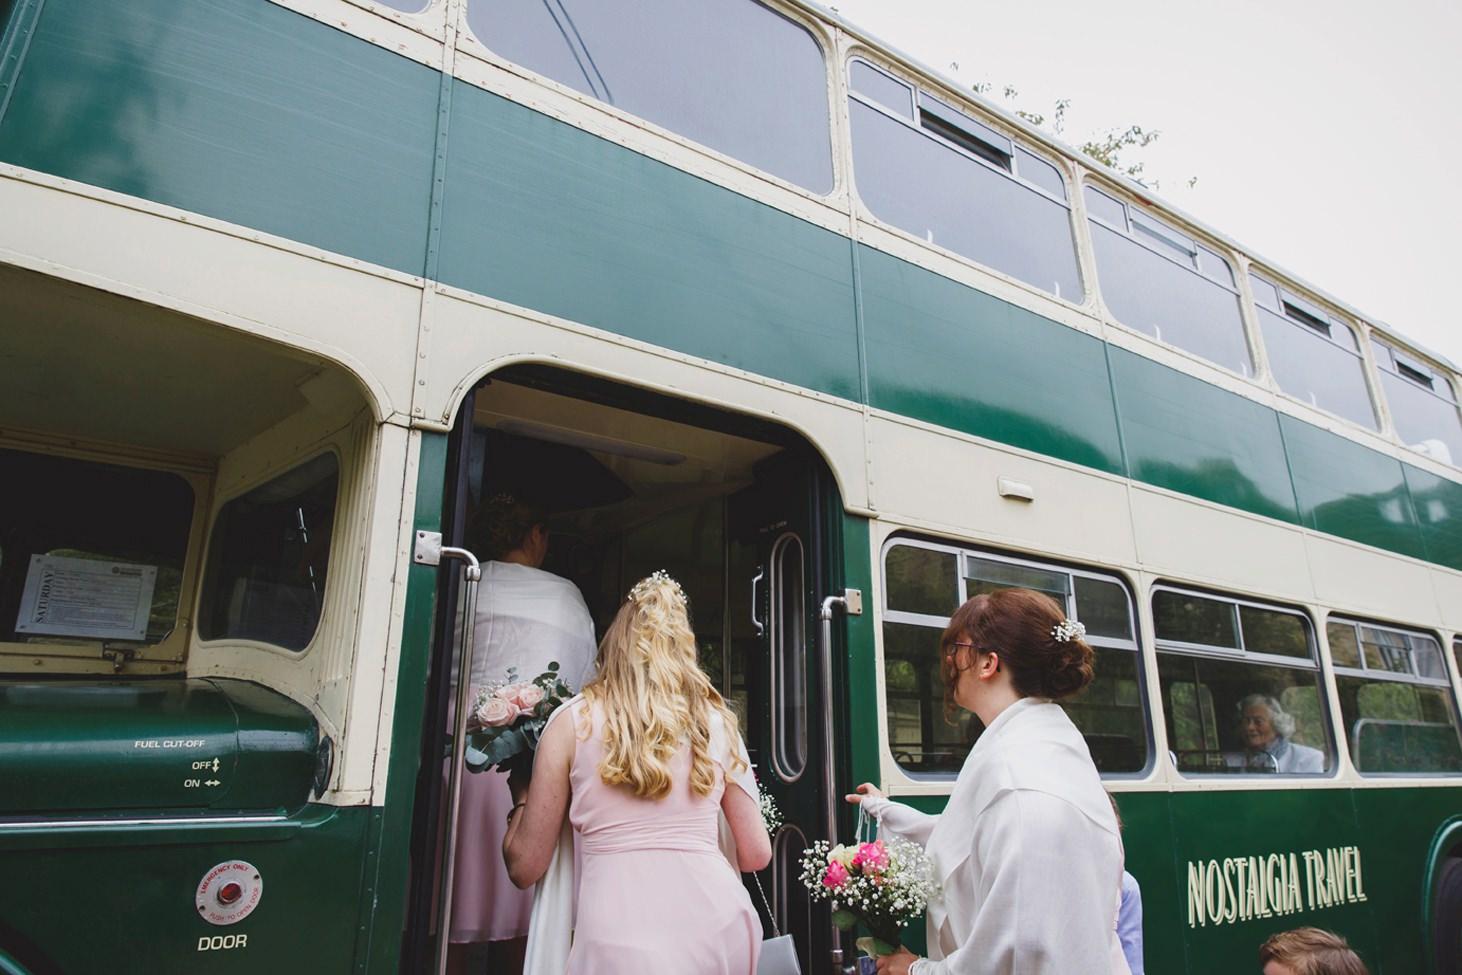 Bodleian library wedding getting on bus